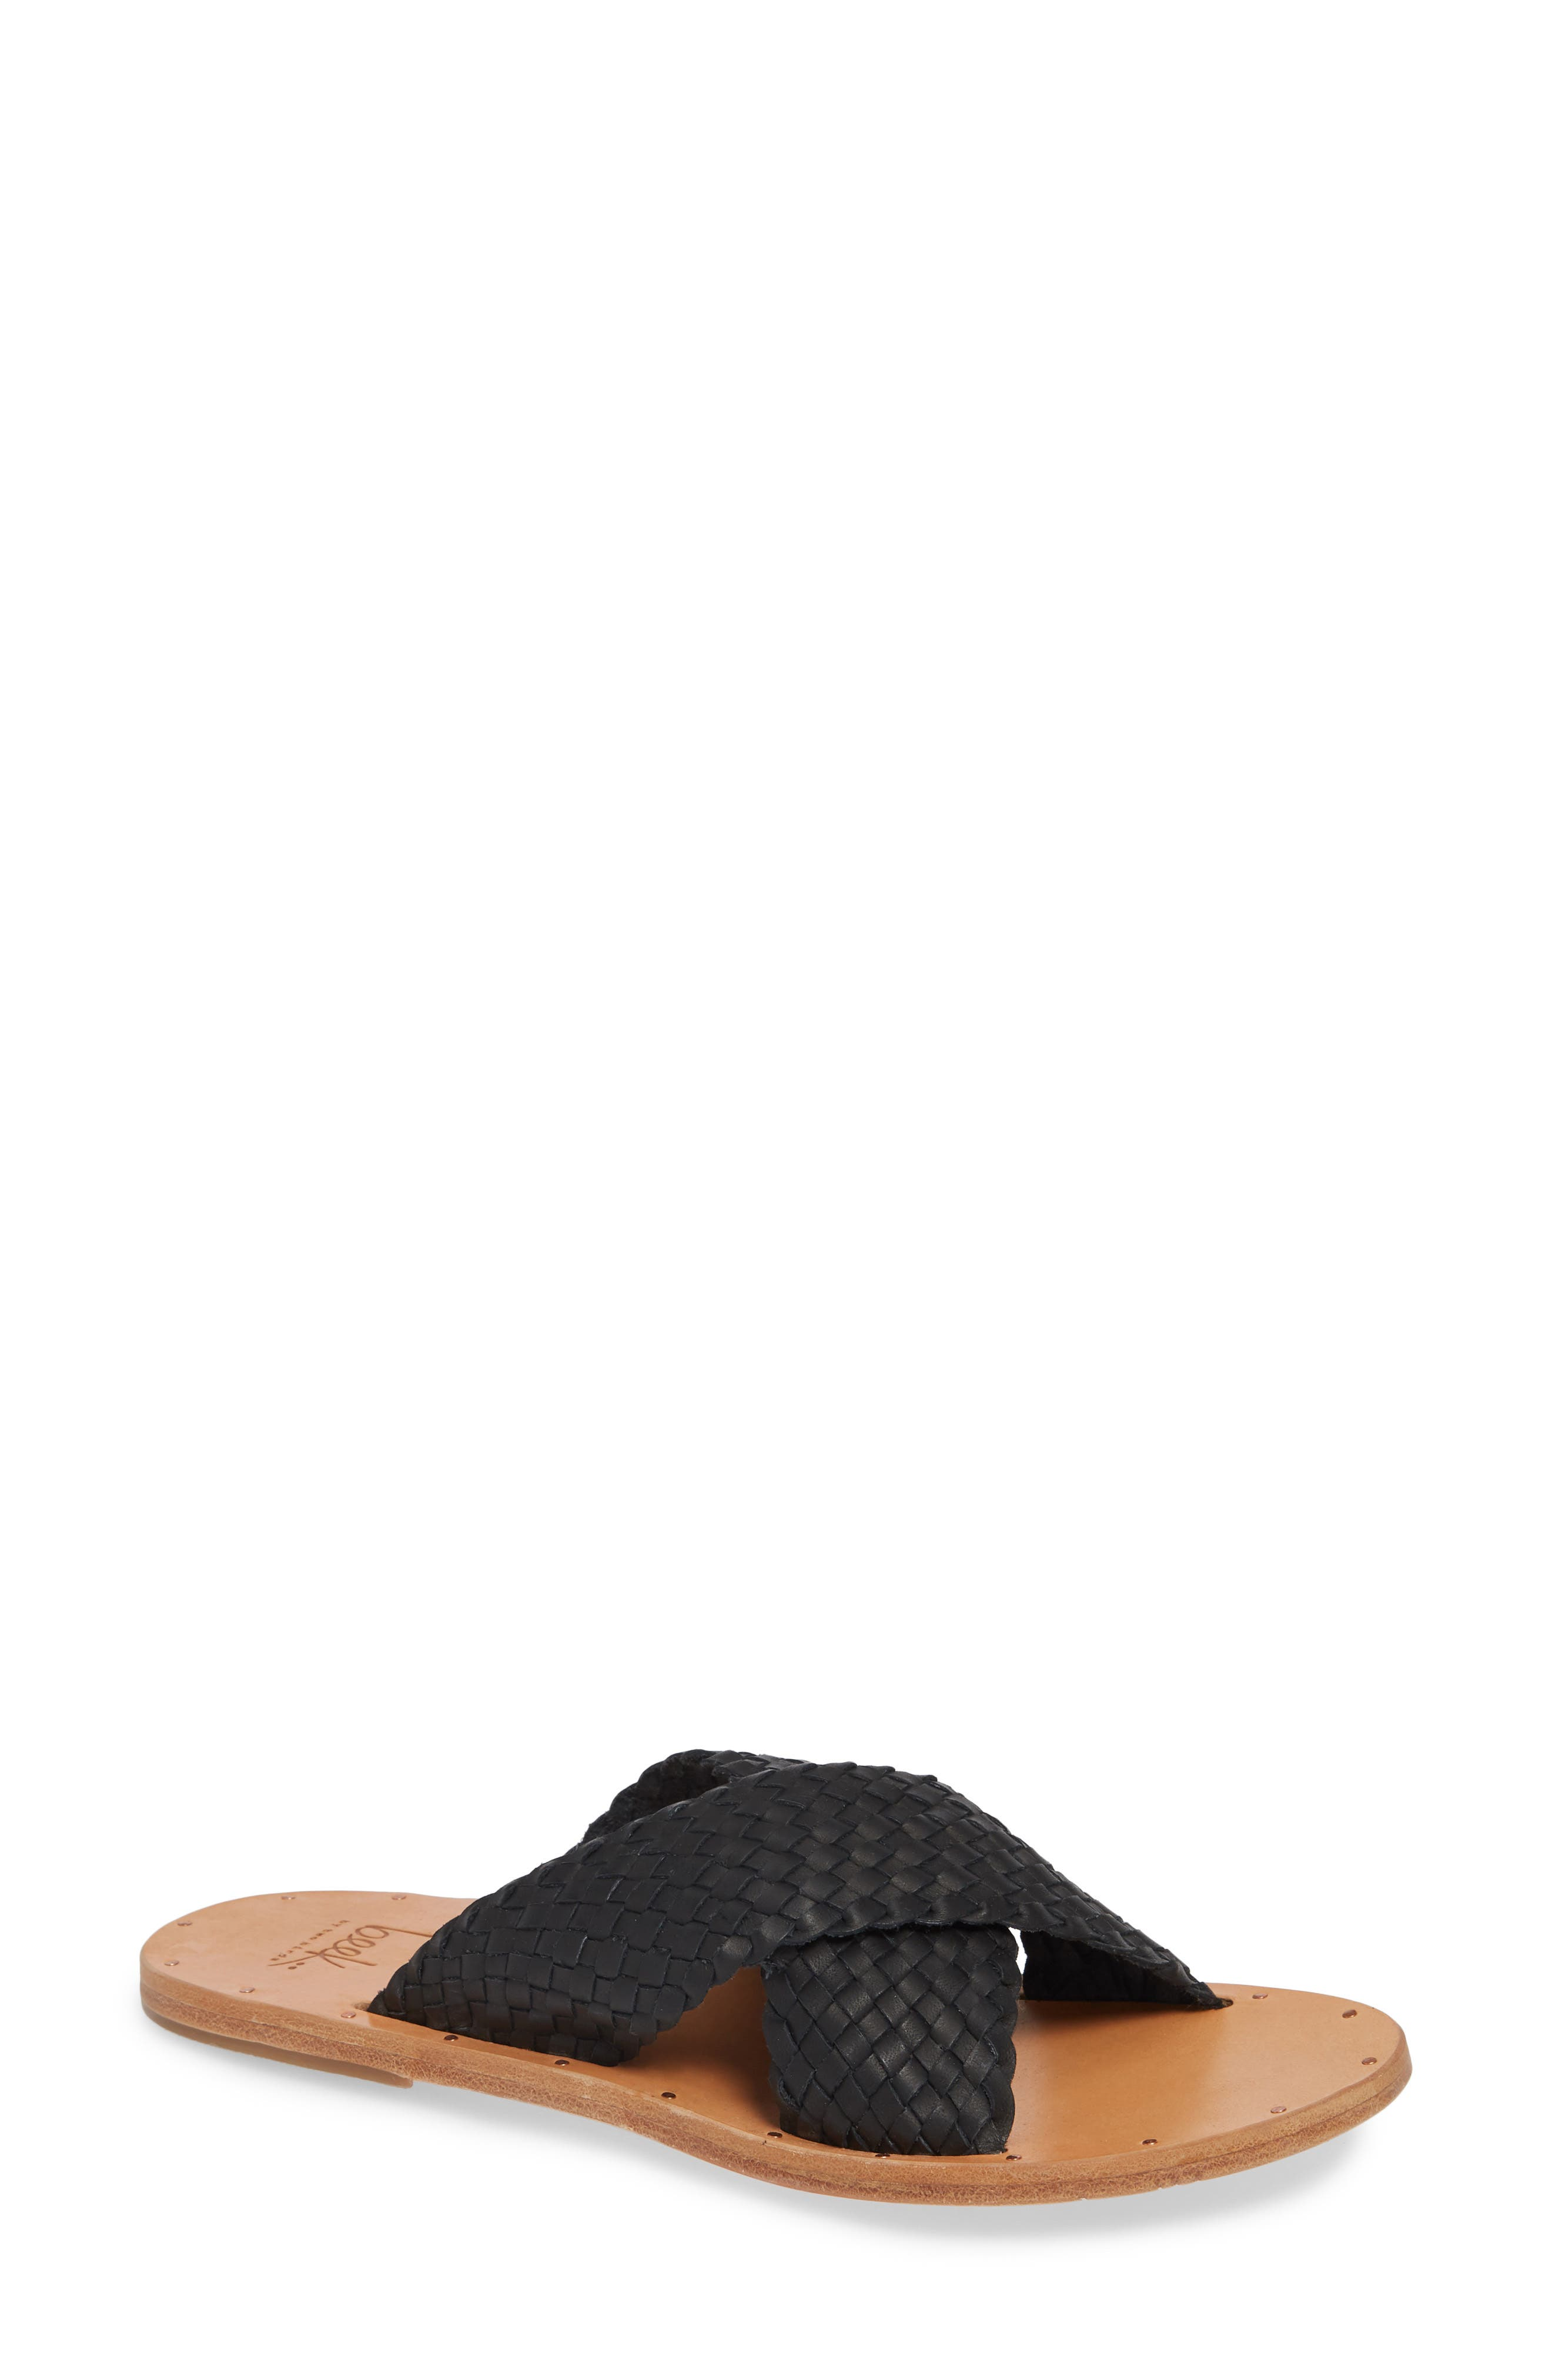 BEEK Plover Sandle in Black Natural